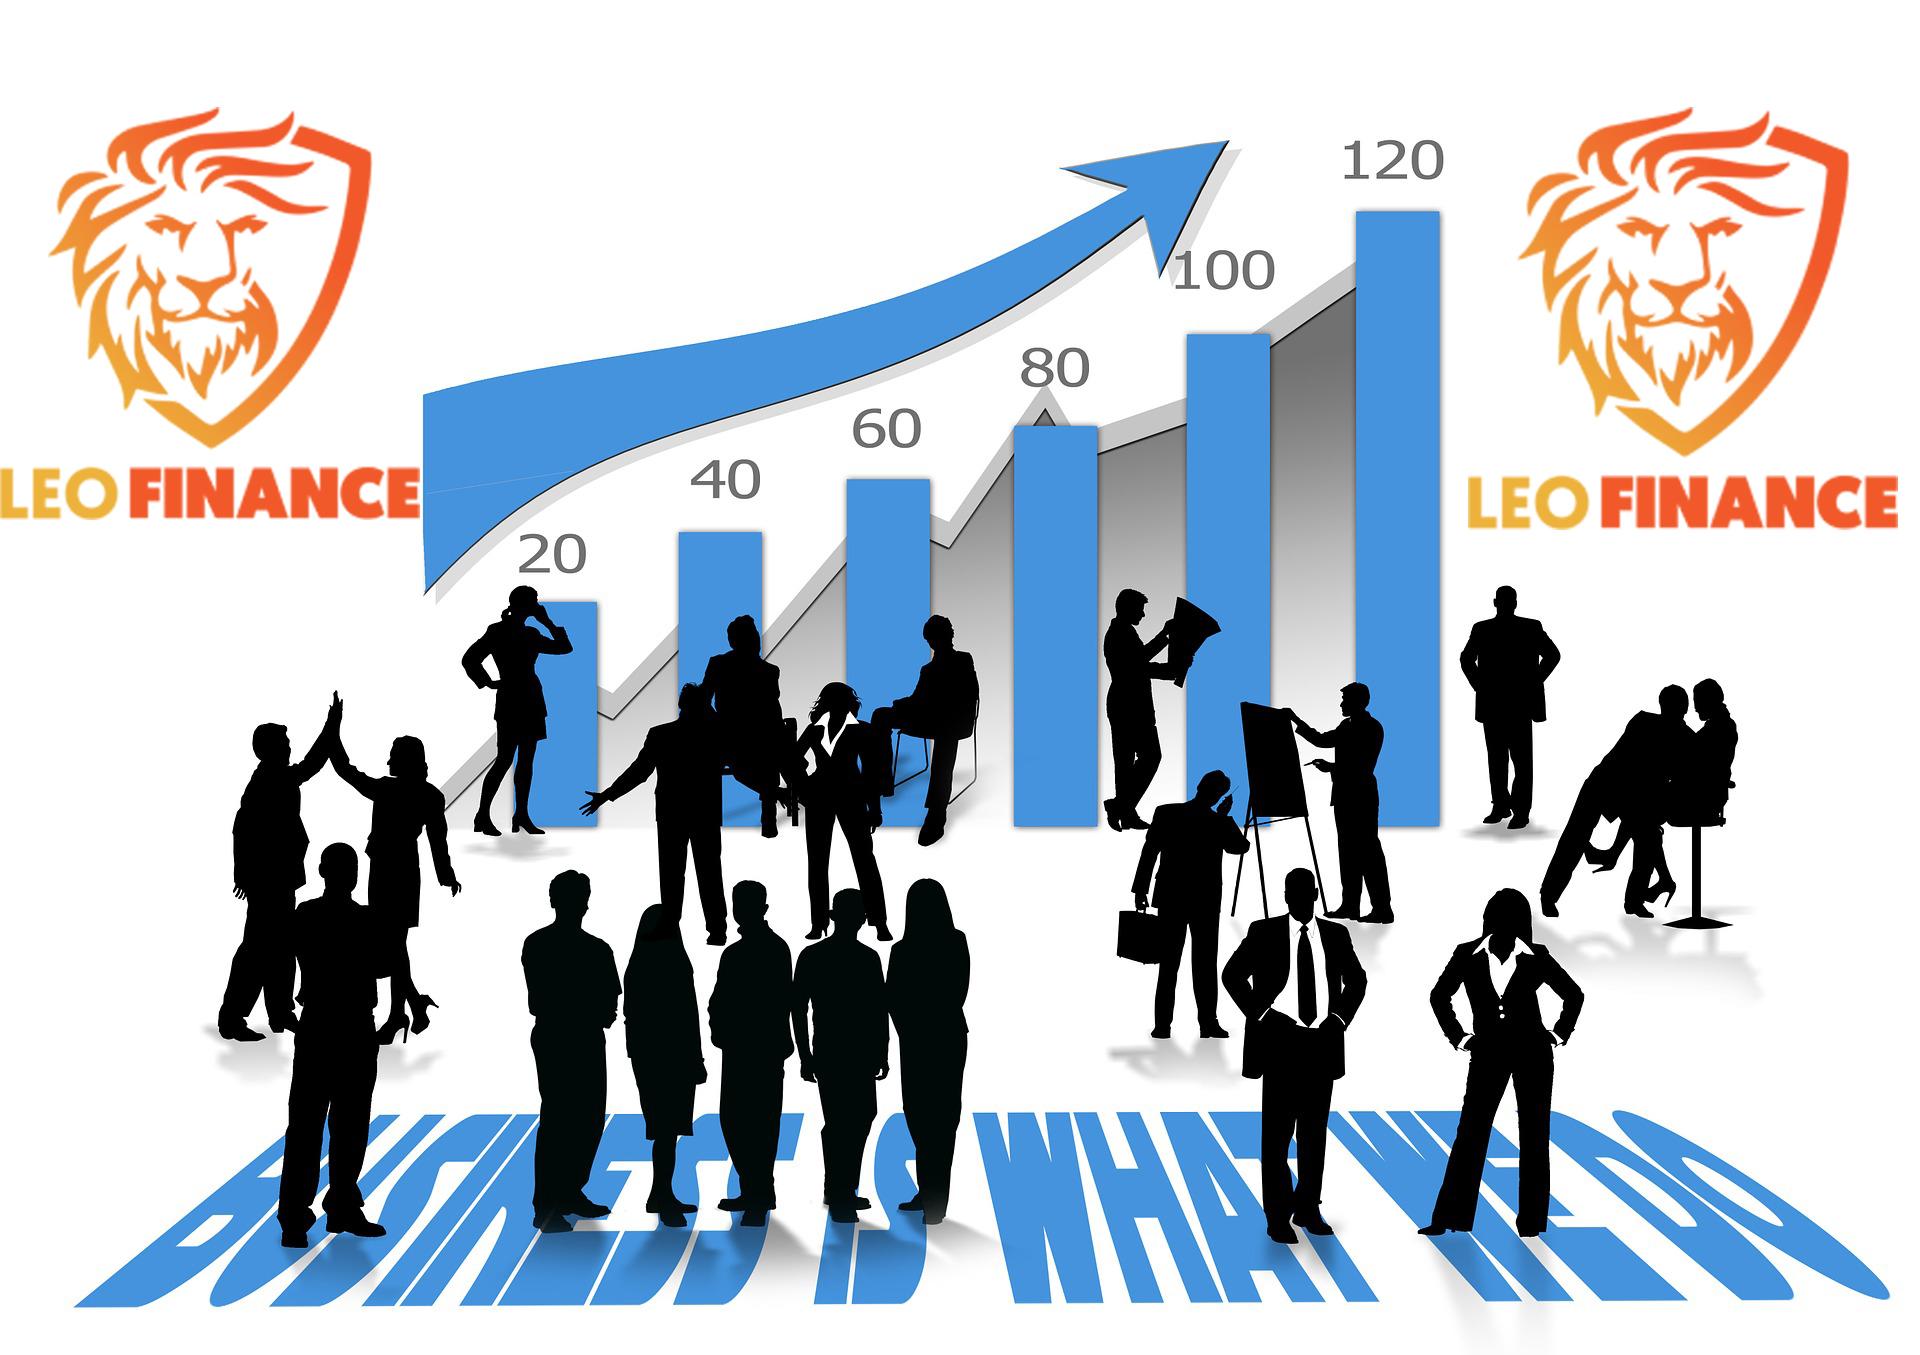 leofinance_leaderboard.jpg